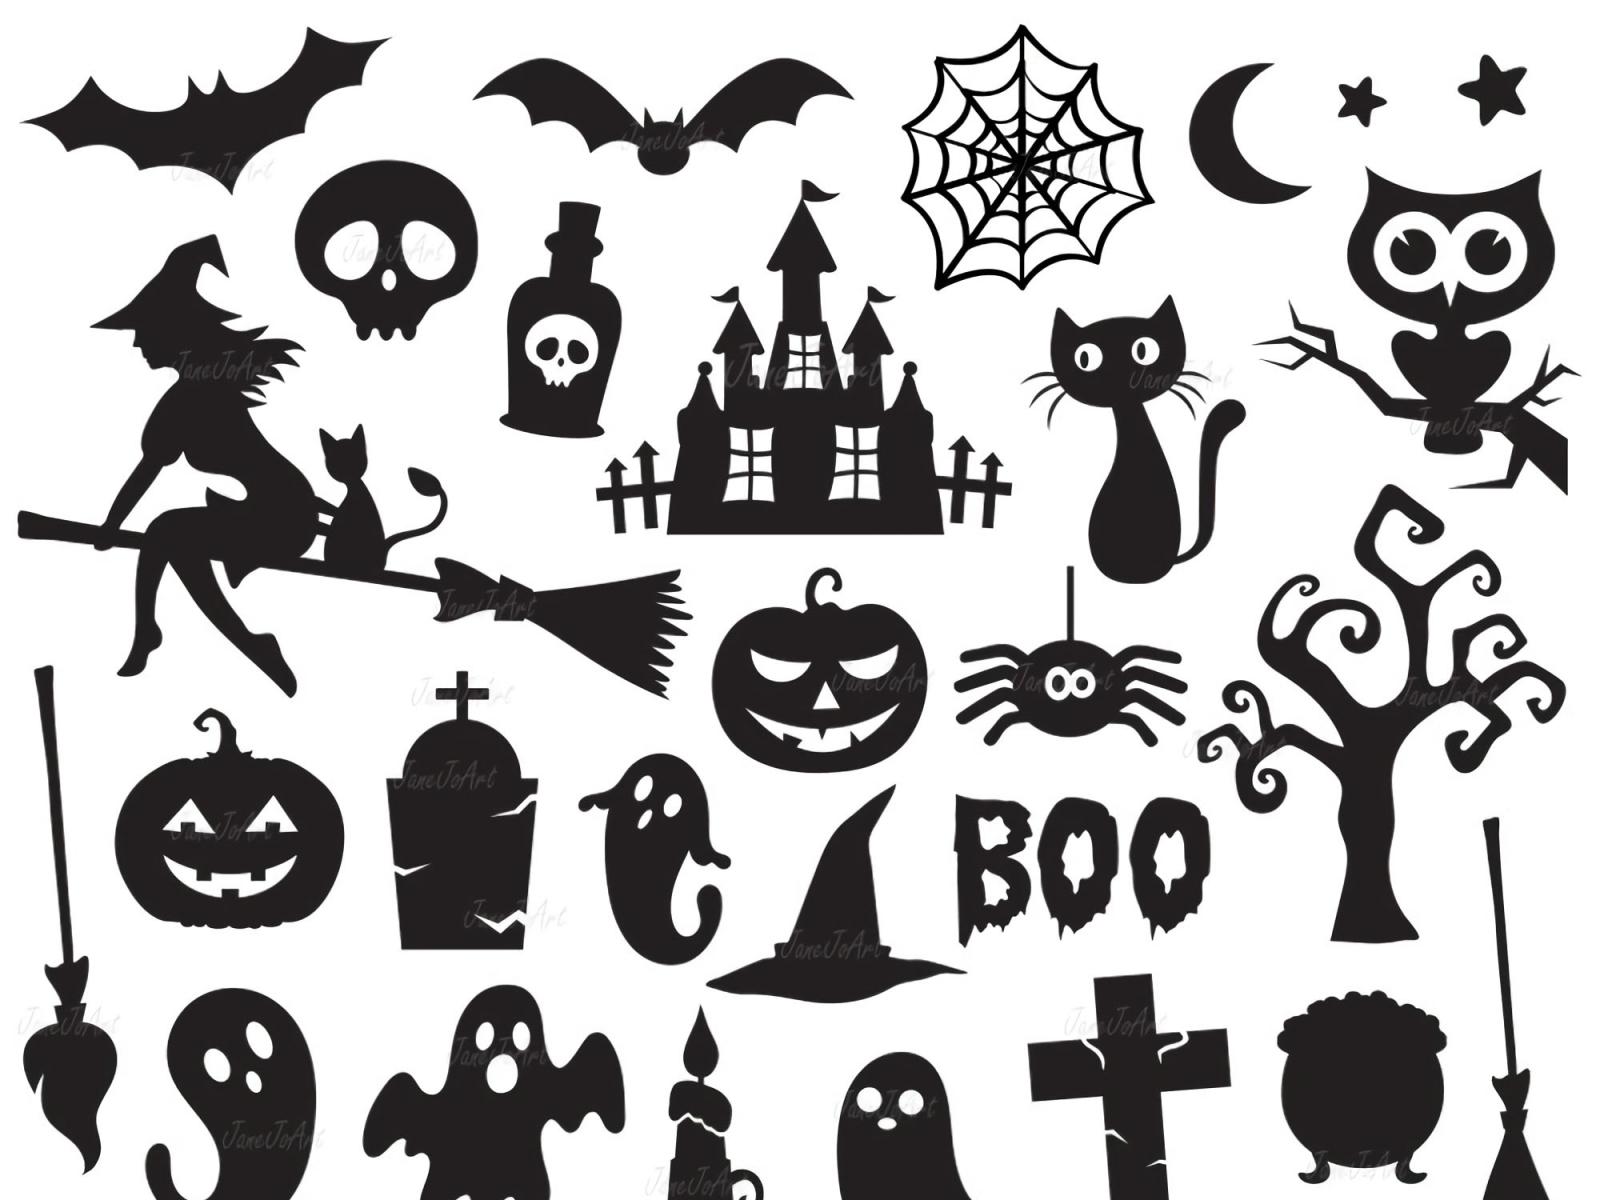 halloween icon vector 1 by criske bankat on Dribbble